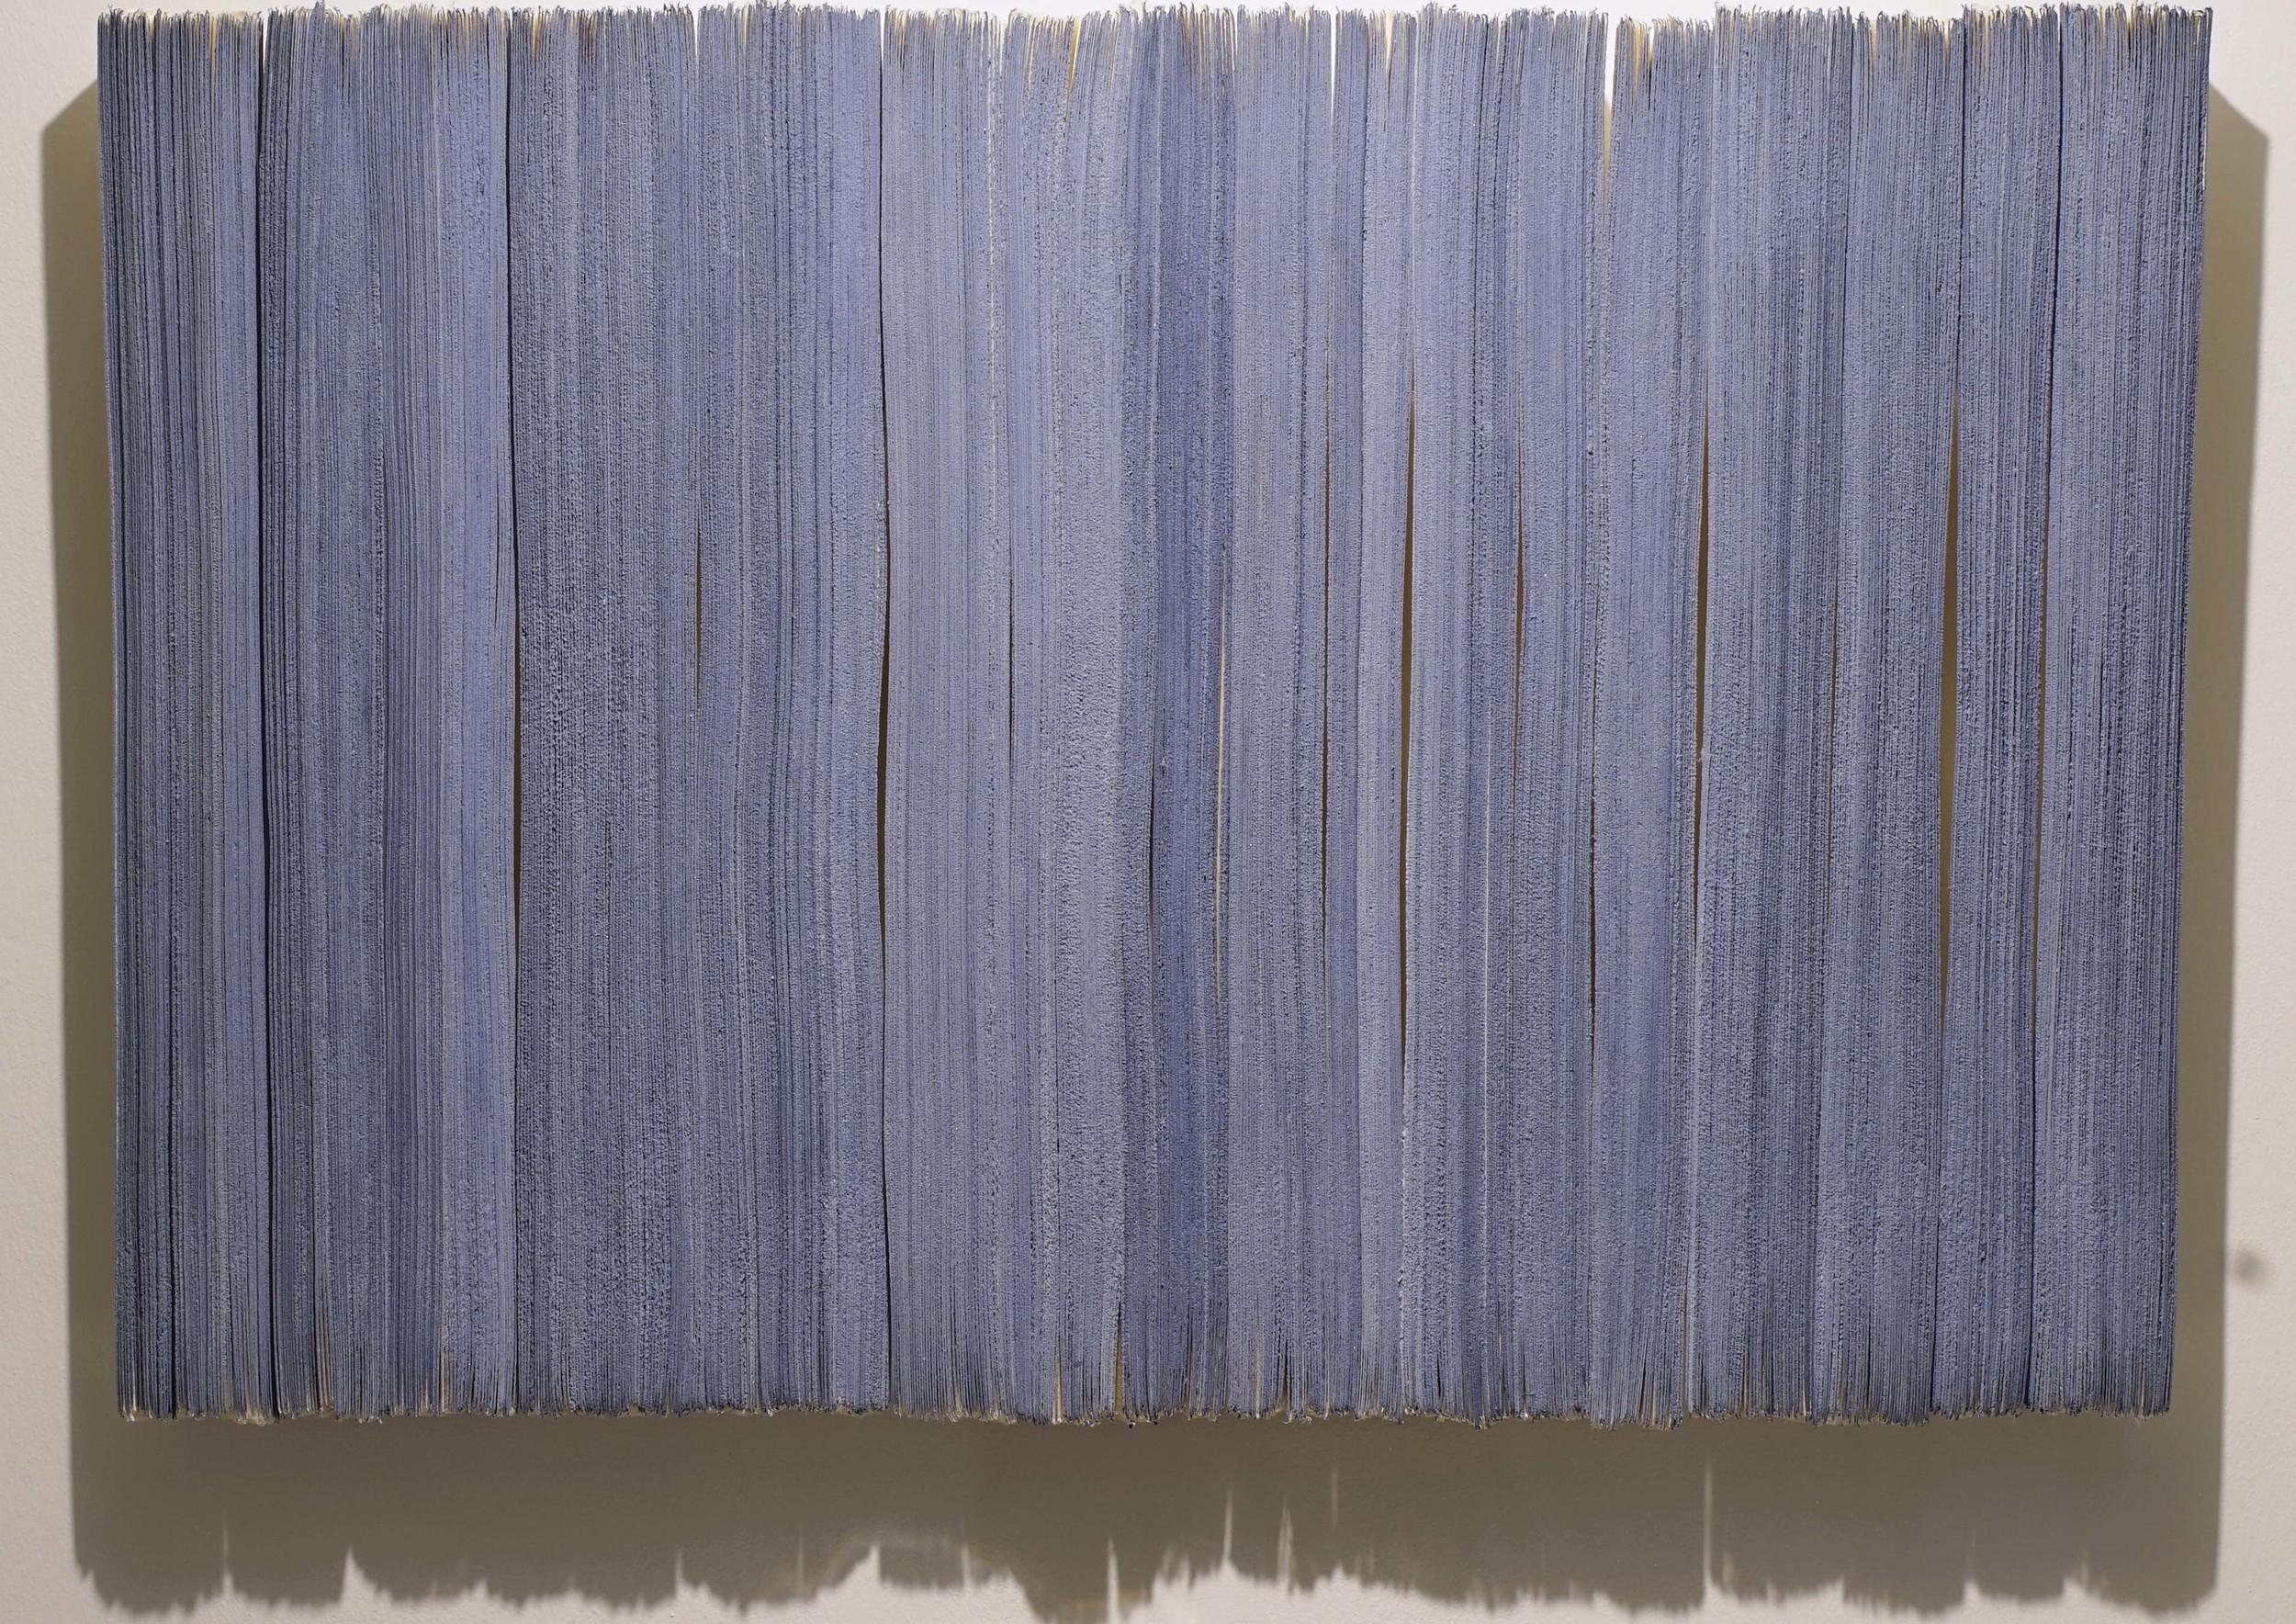 n. 324 - cementation  2015 Acid-free cotton pulp watercolour paper, Ultramarine Ash pigment, archival EVA glue and  nikawa  (cow hide glue) H58 x W88 x D3.5 cm (artwork)